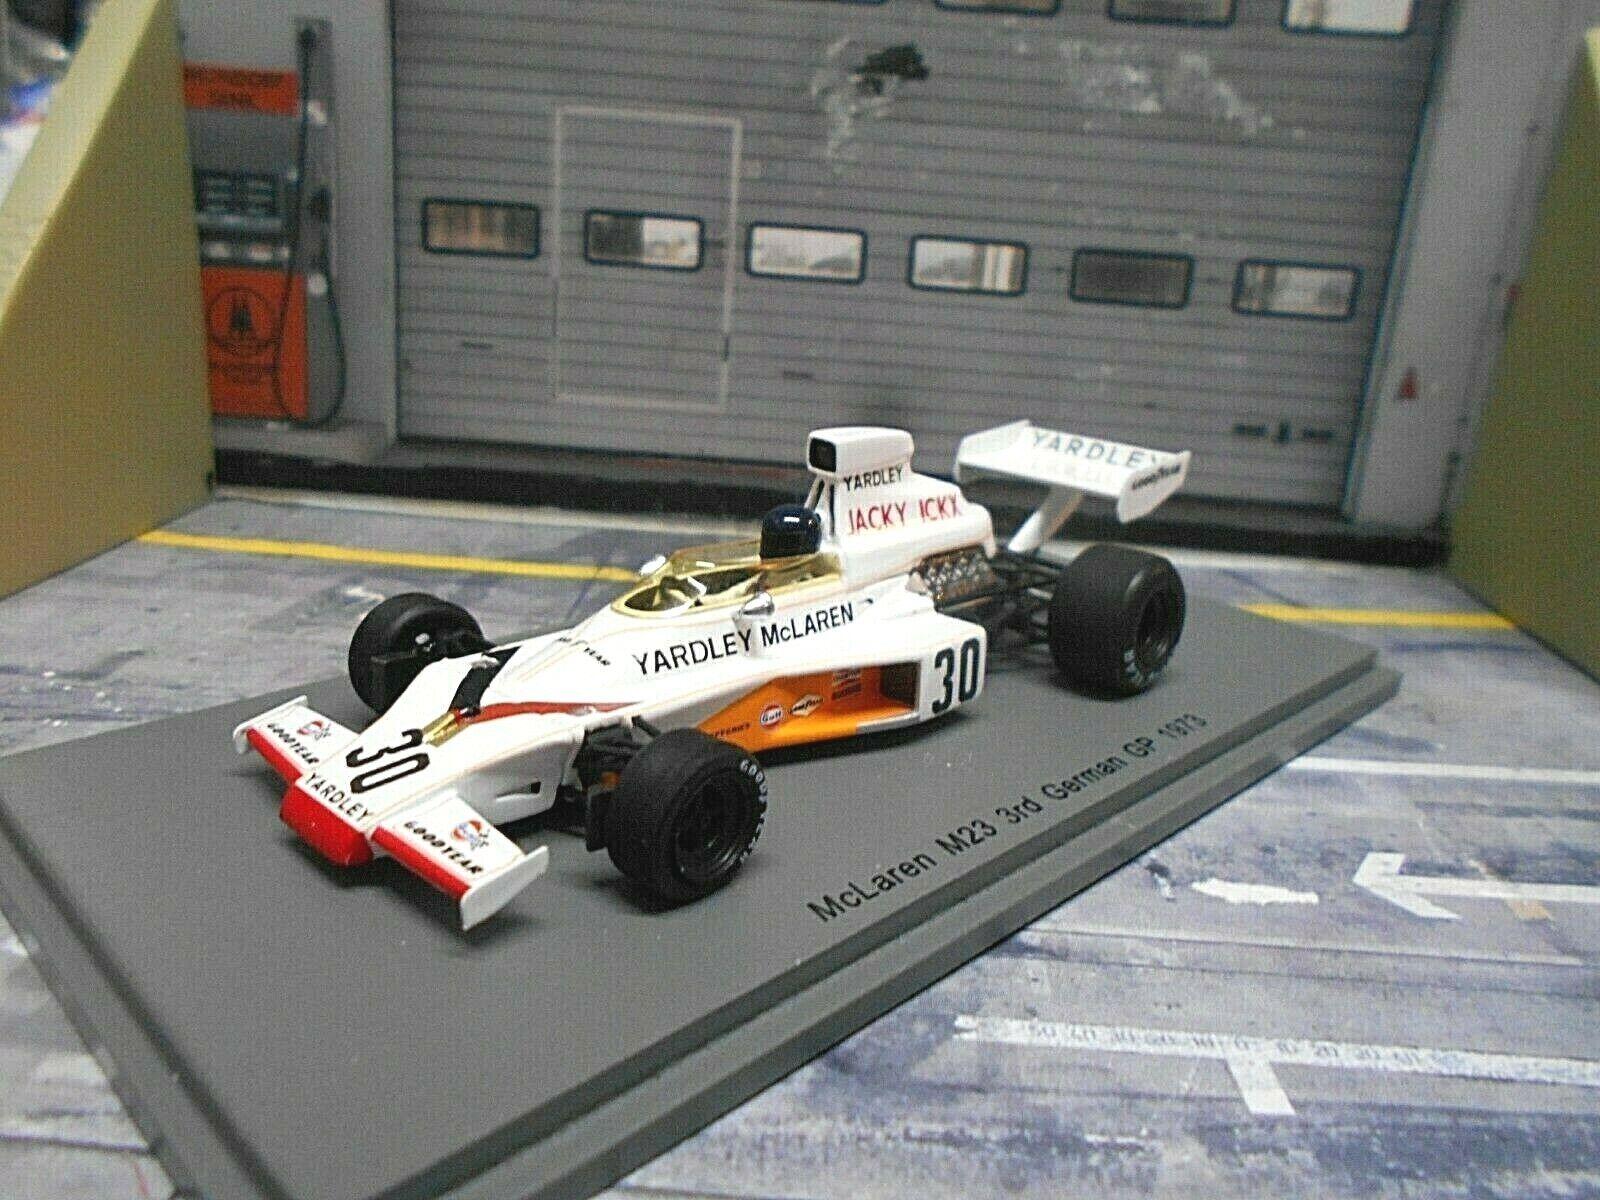 F1 mclaren ford cosworth m23 Ickx German gp 1973 2nd Yardley Spark 1 43